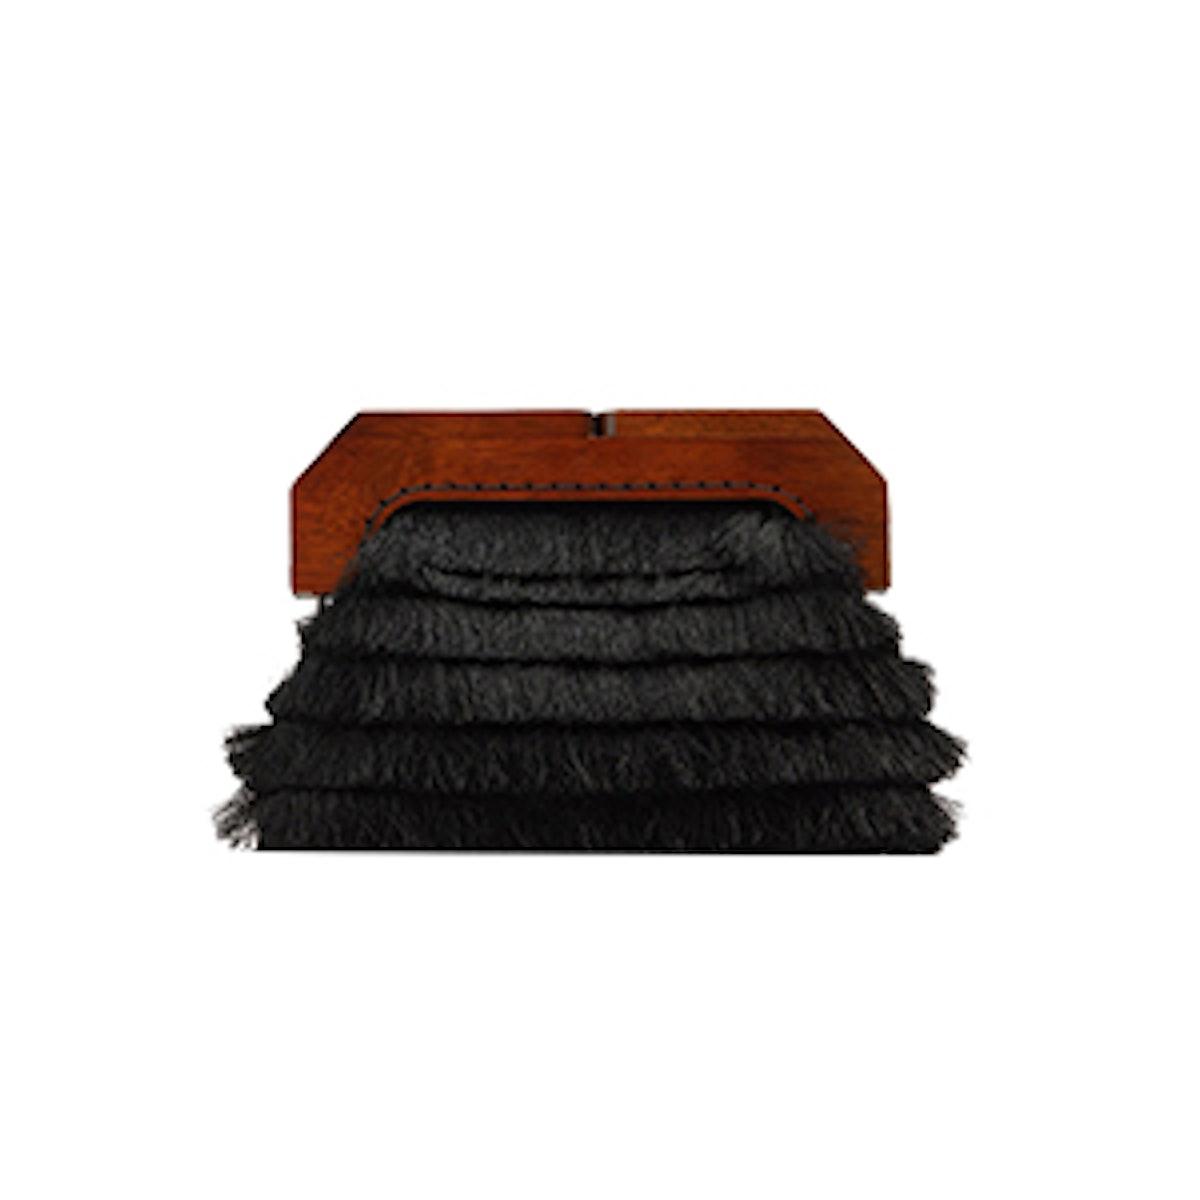 Wooden Handle Fringe Clutch